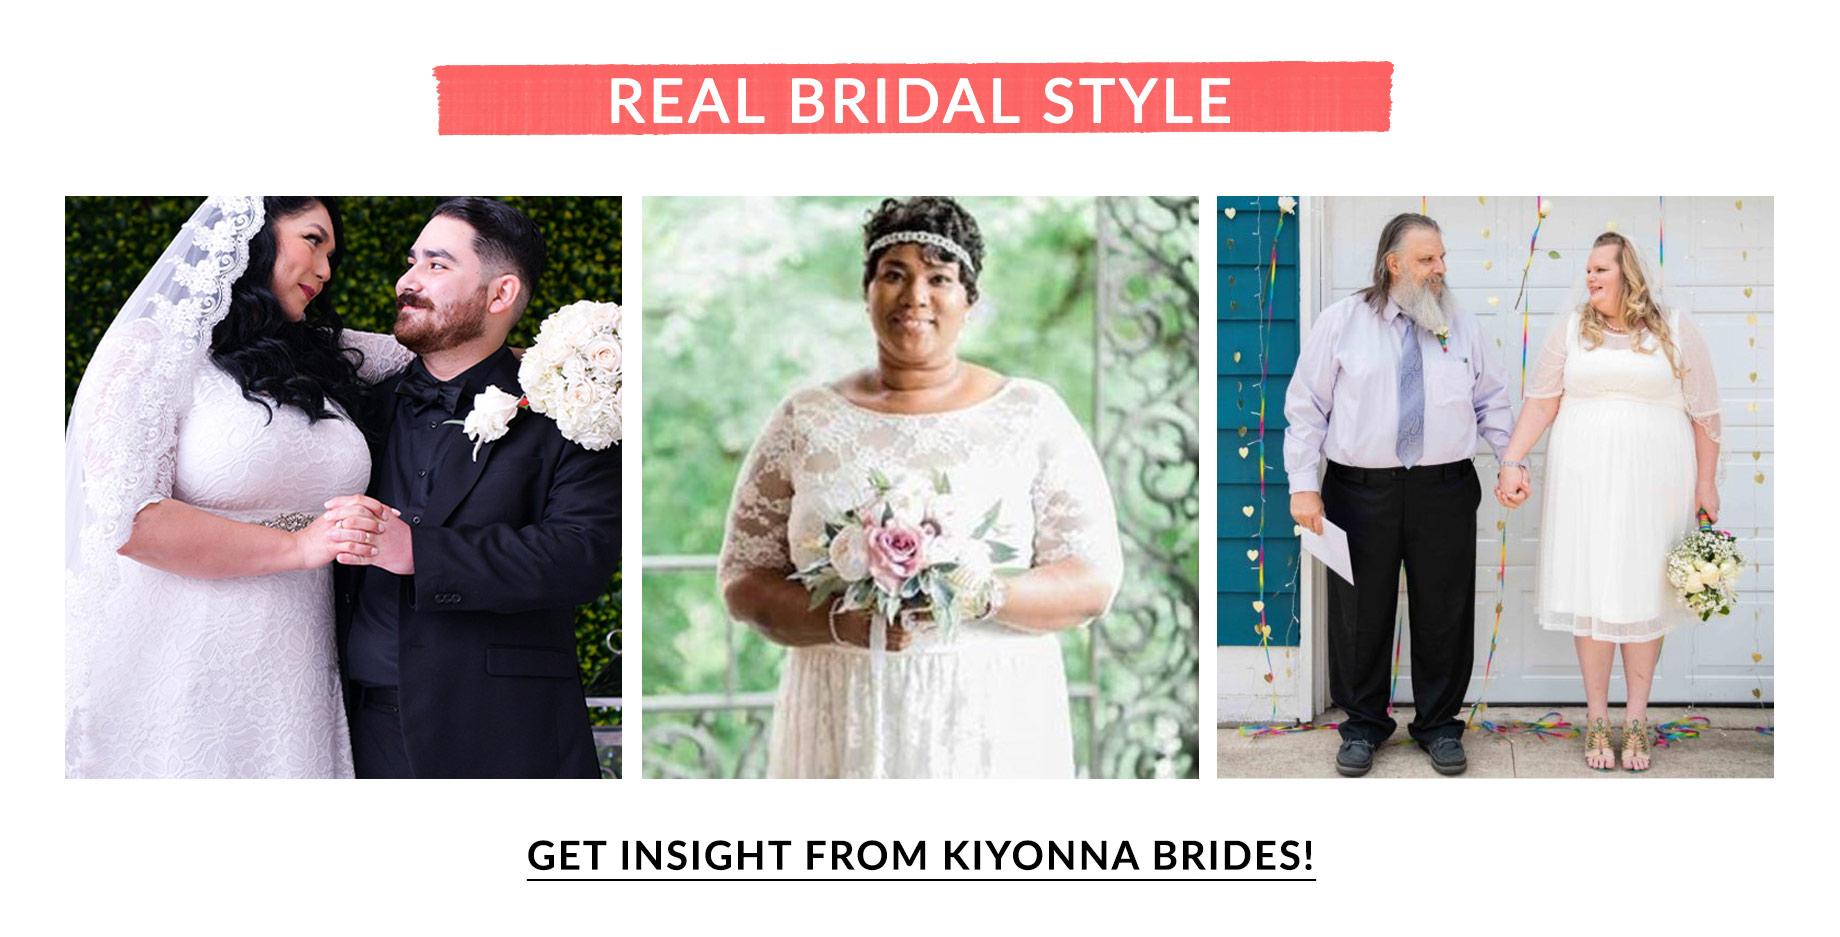 Real Bridal Style